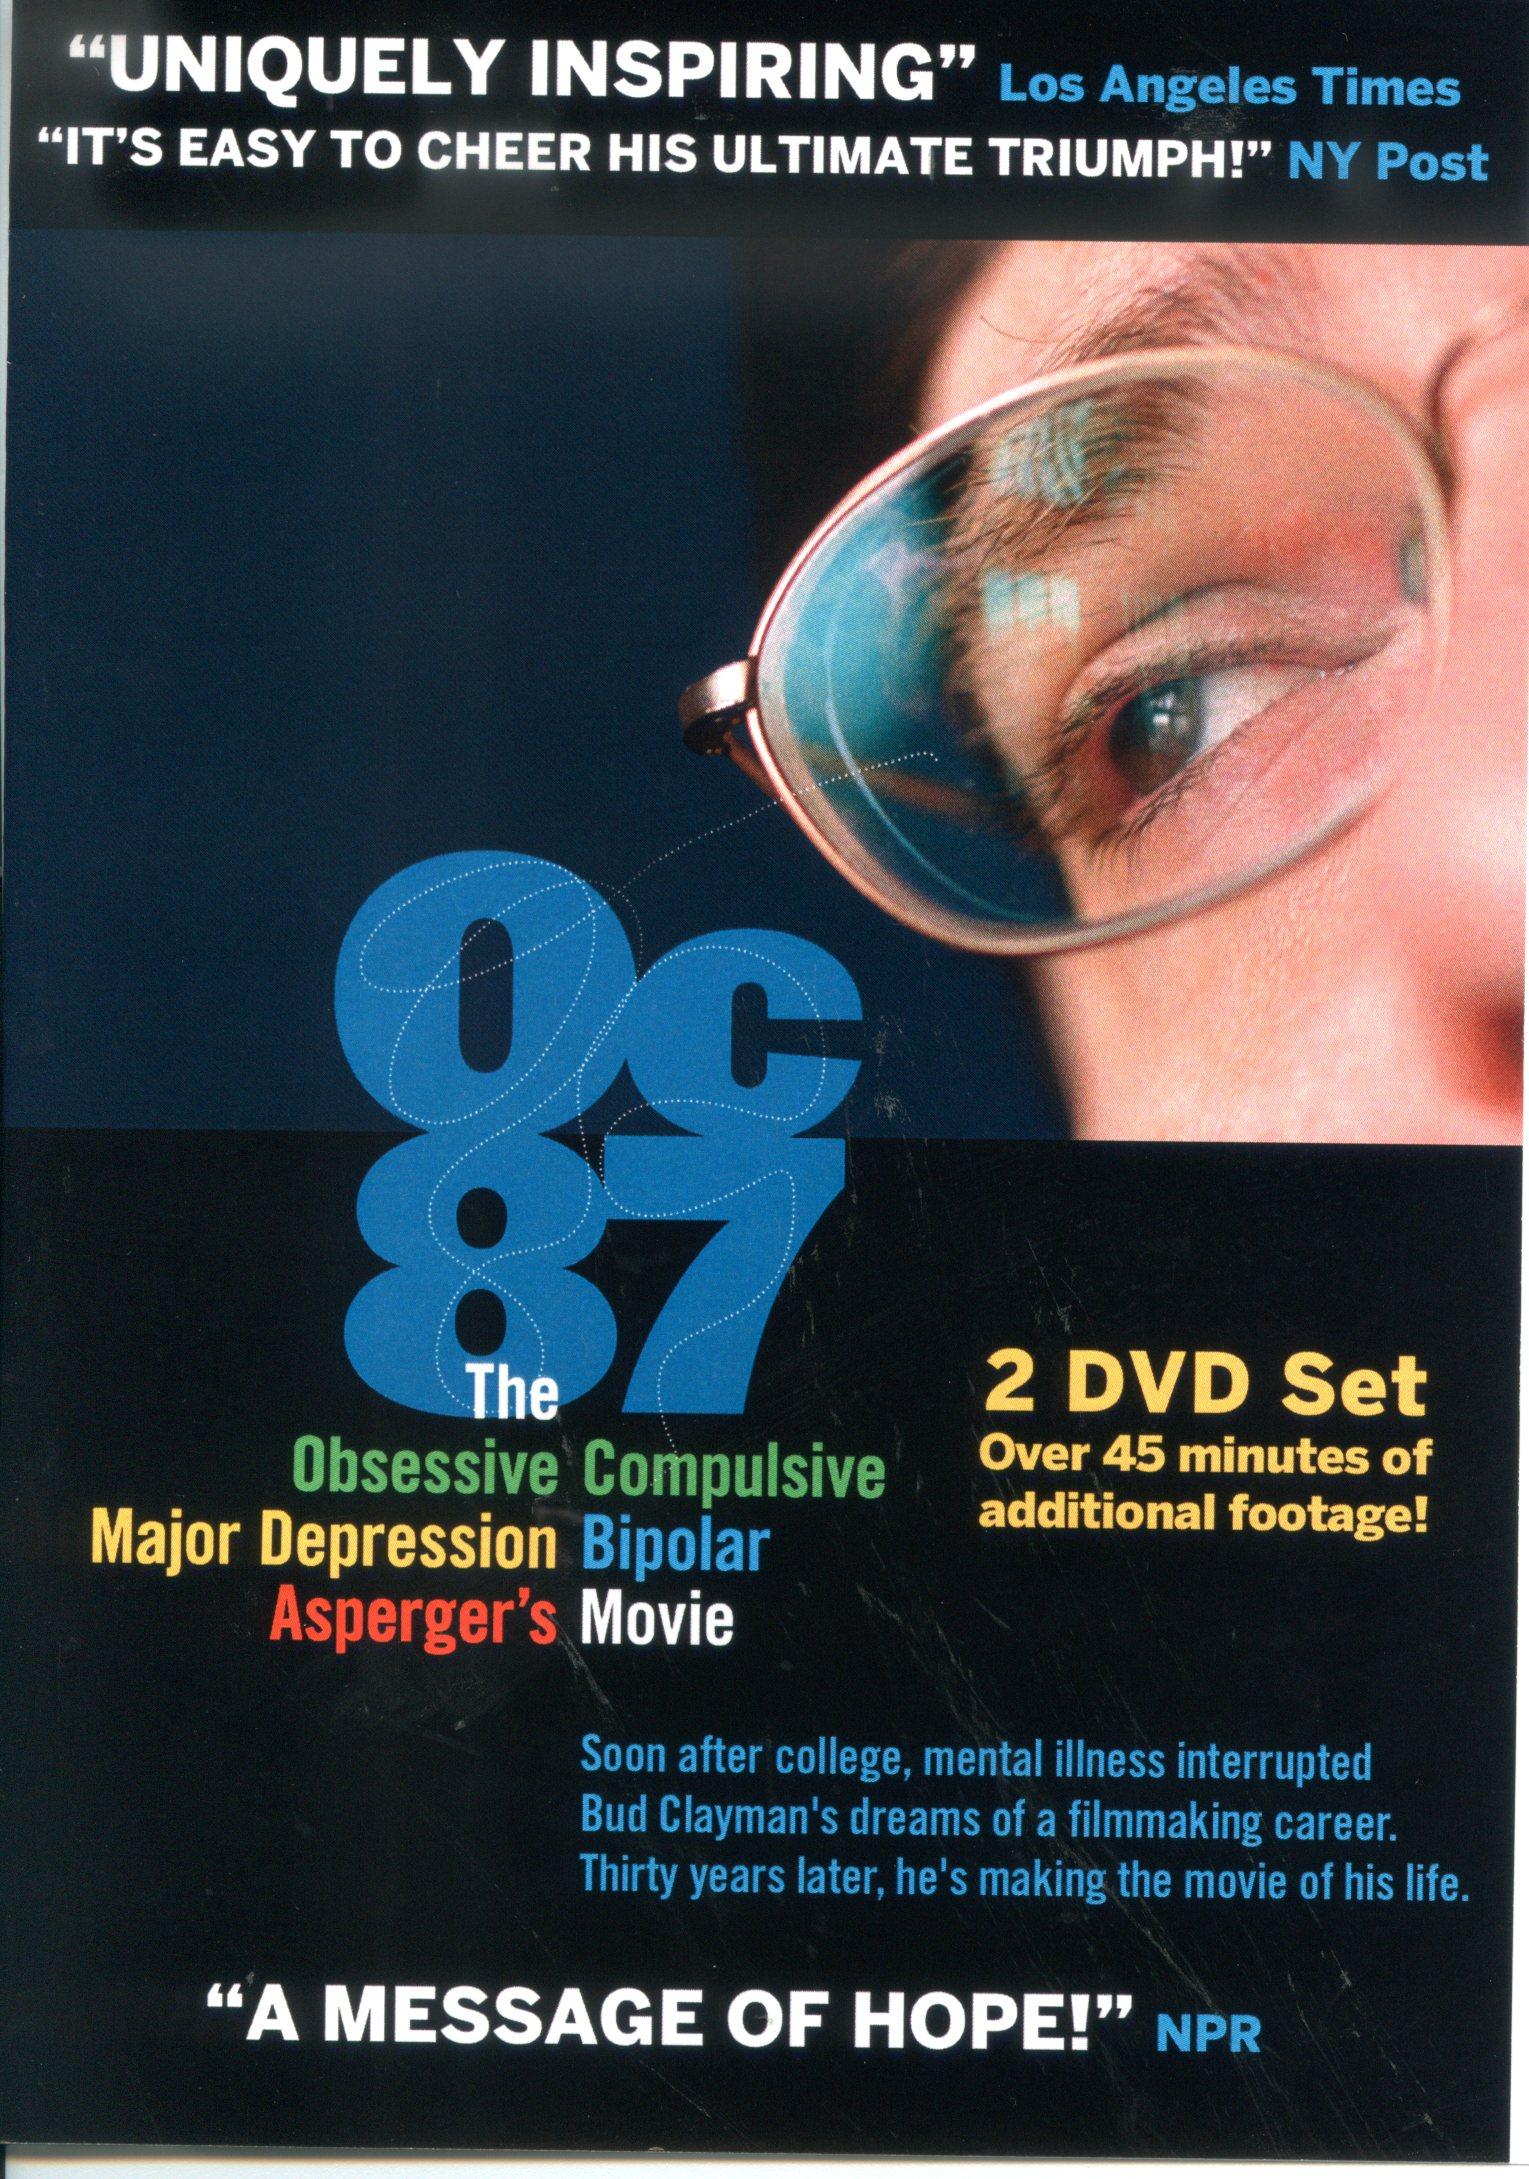 OC87 the obsessive compulsive major depression bipolar Asperger